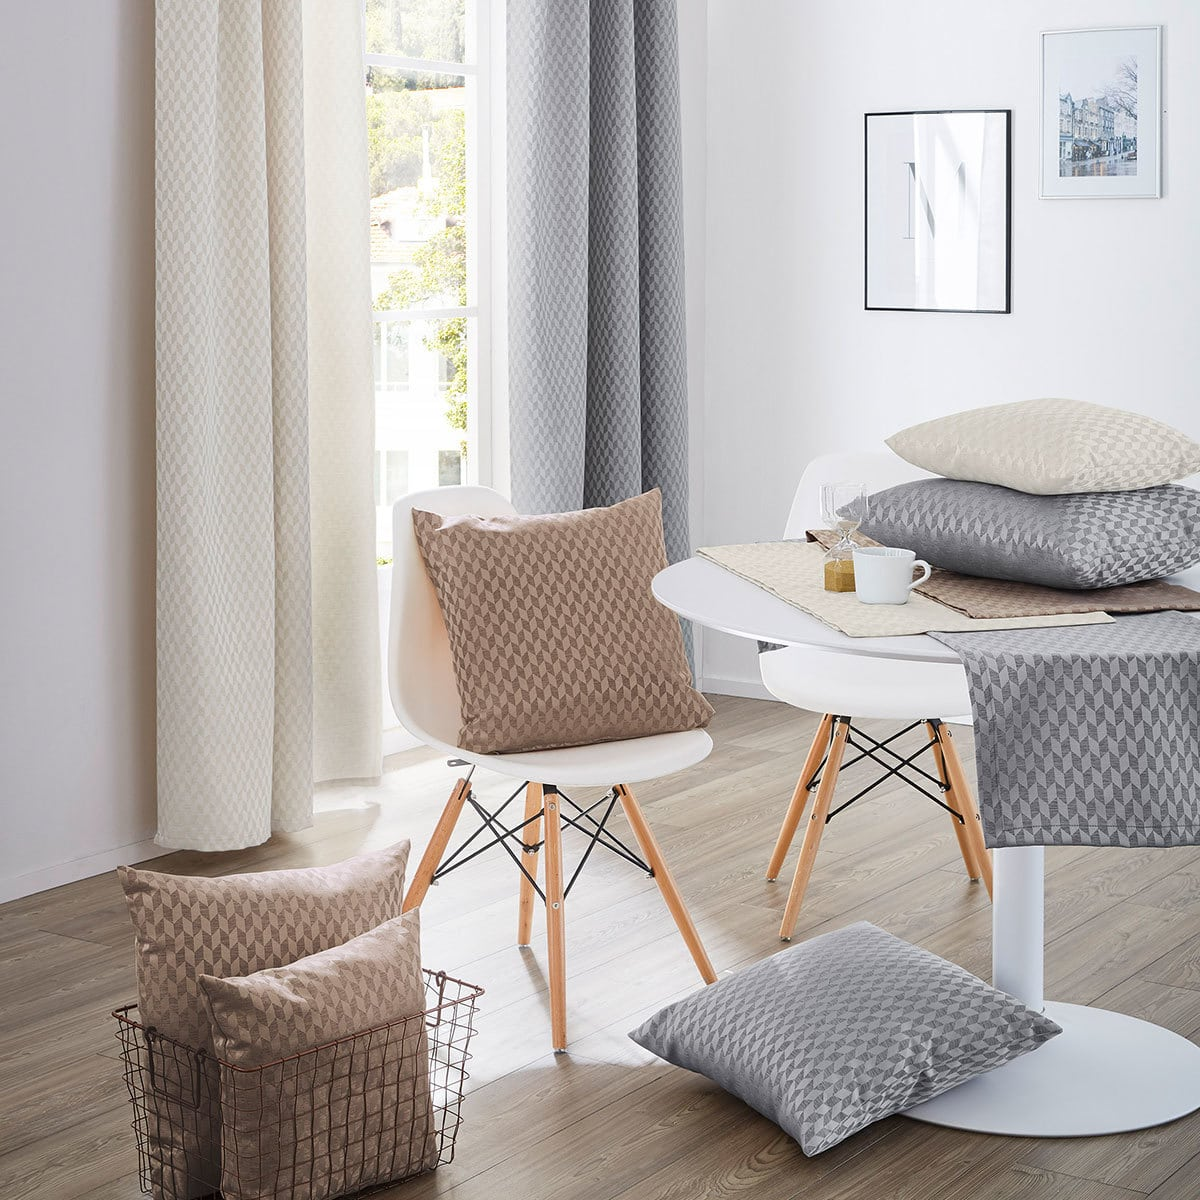 sun garden jacquard kissenh lle luxor g nstig online kaufen bei bettwaren shop. Black Bedroom Furniture Sets. Home Design Ideas